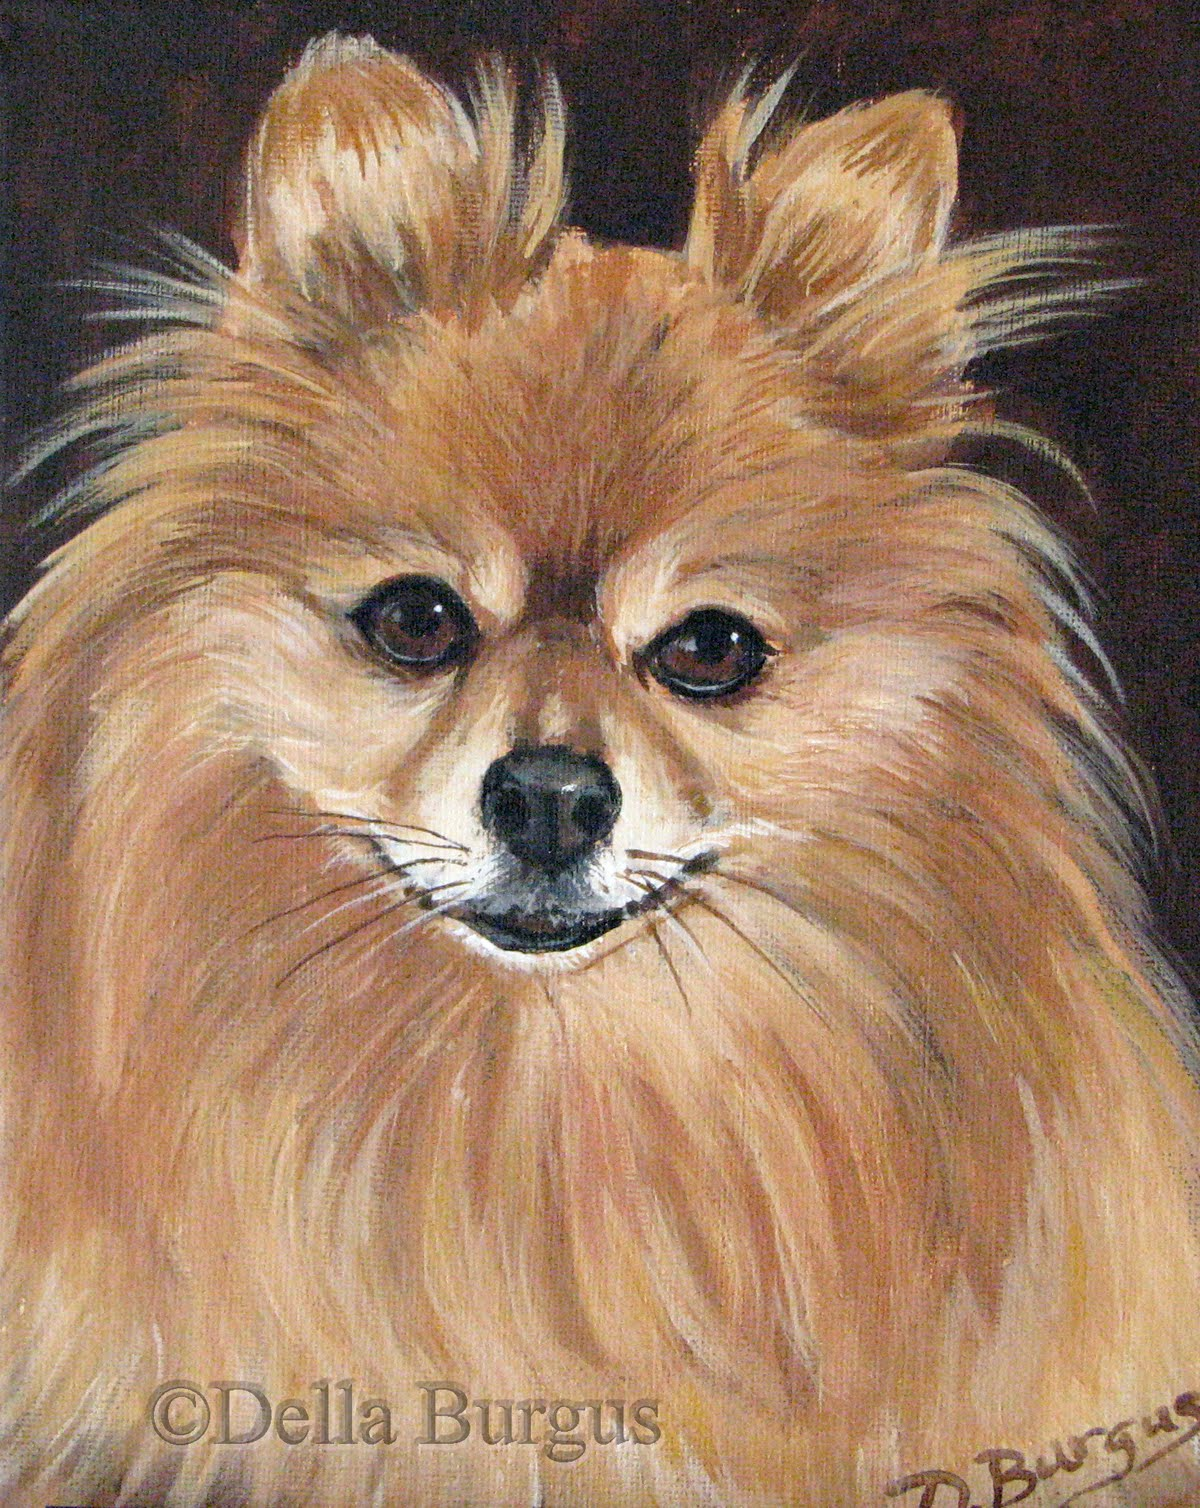 art helping animals  canine art dogs pomeranian dog